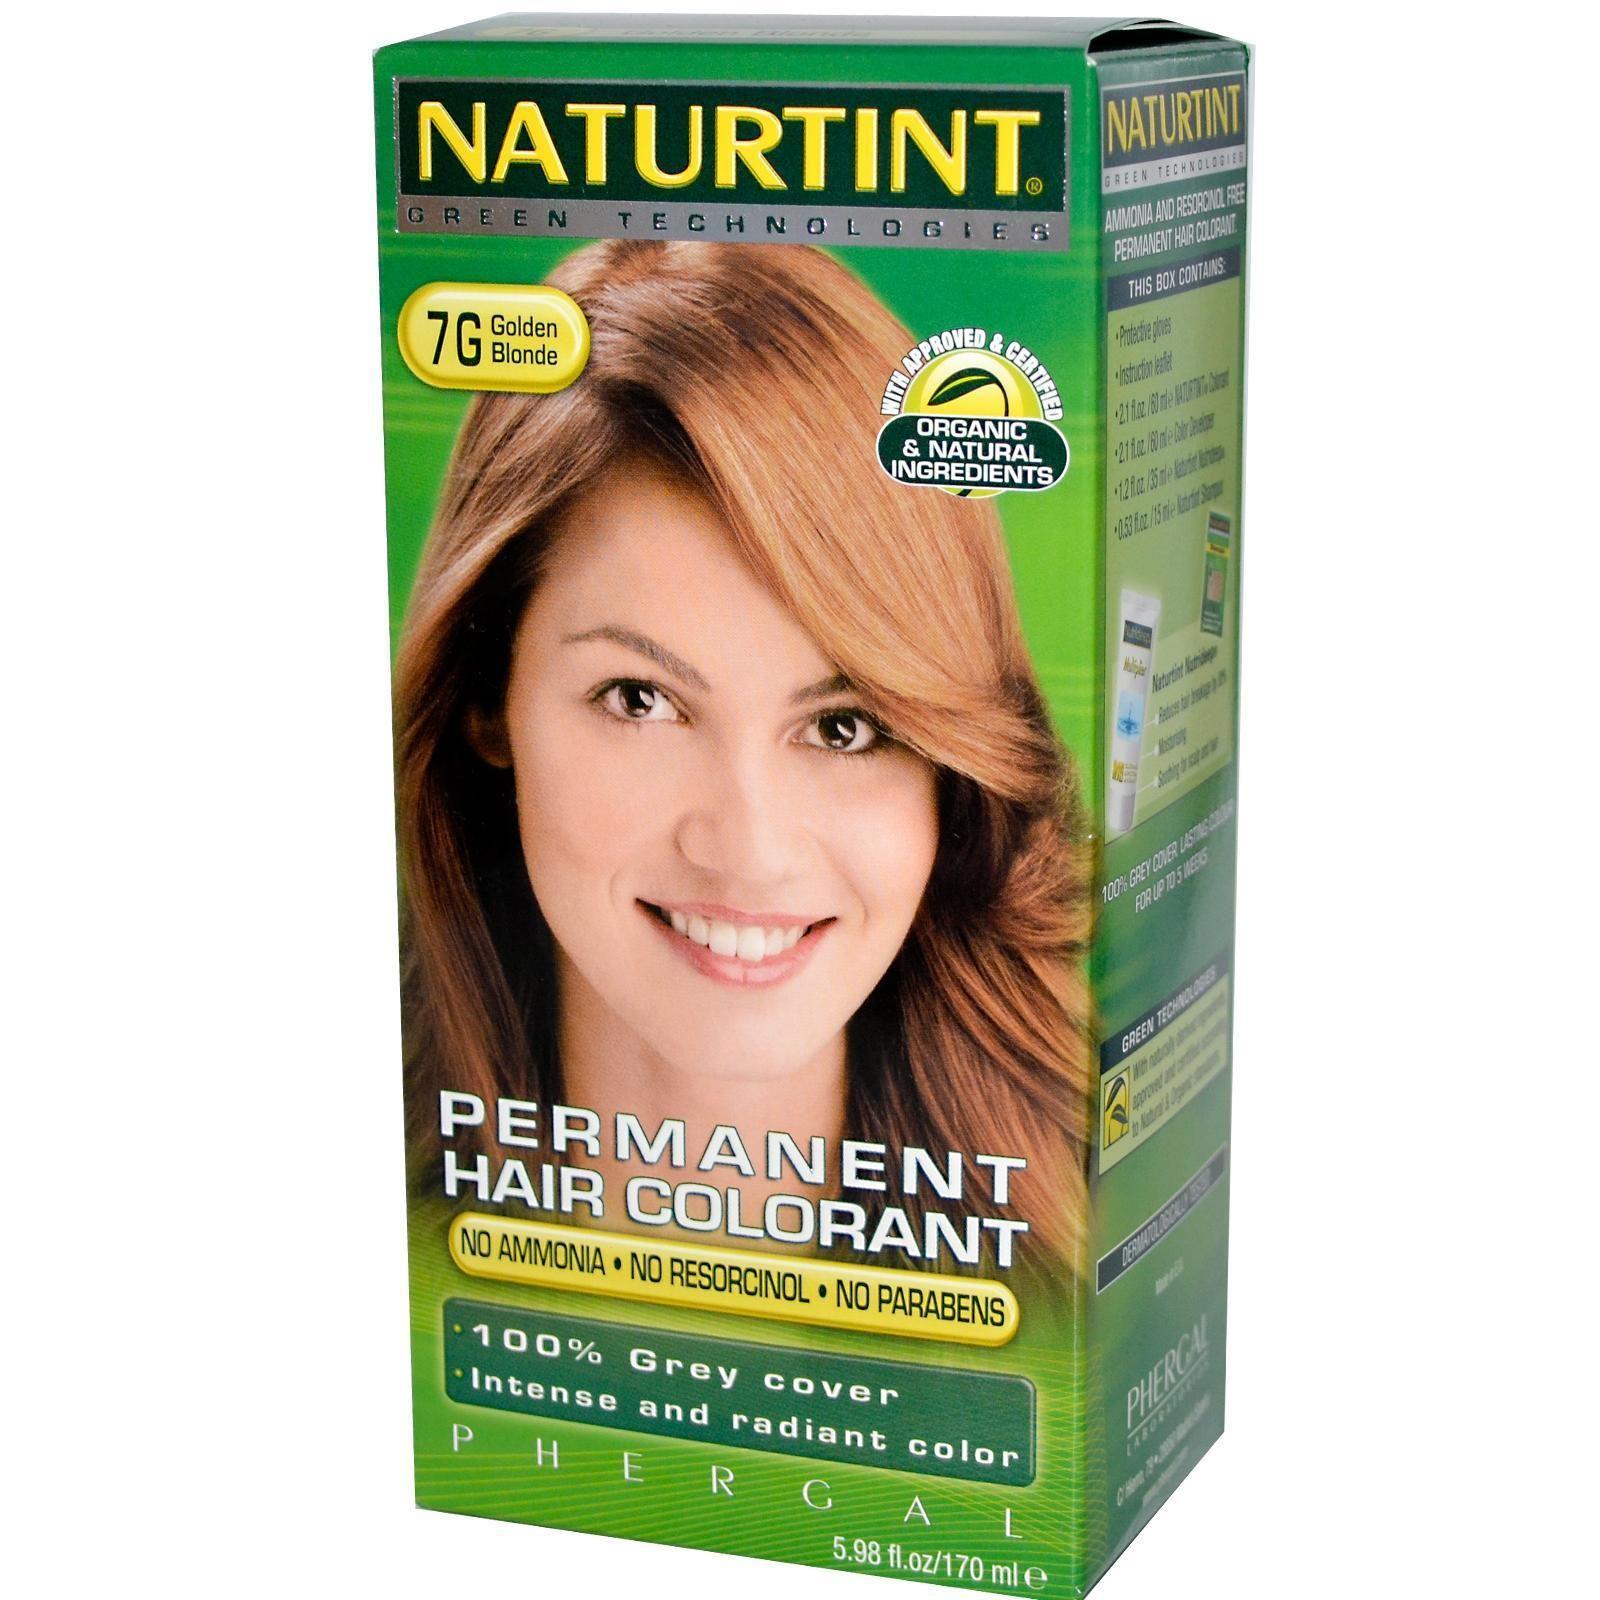 Naturtint 7g Golden Blonde Hair Color 1xkit Golden Blonde